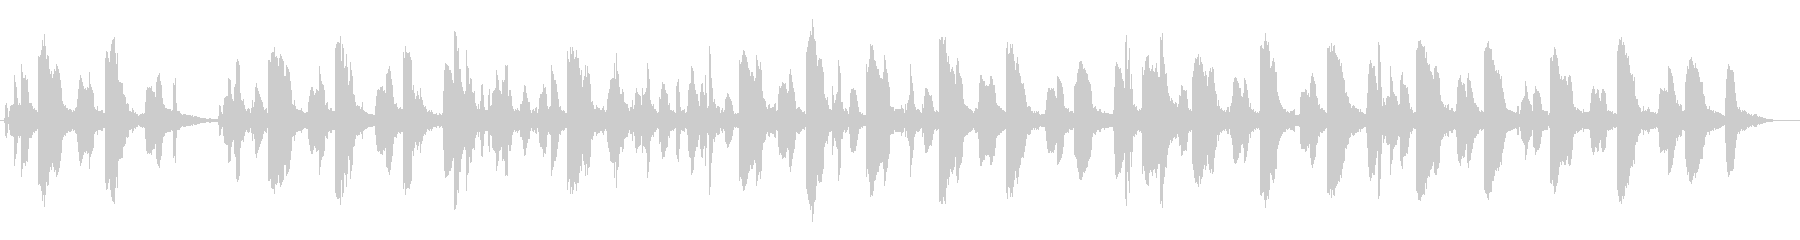 KANT近未来ロボット言語効果音2の未再生の波形